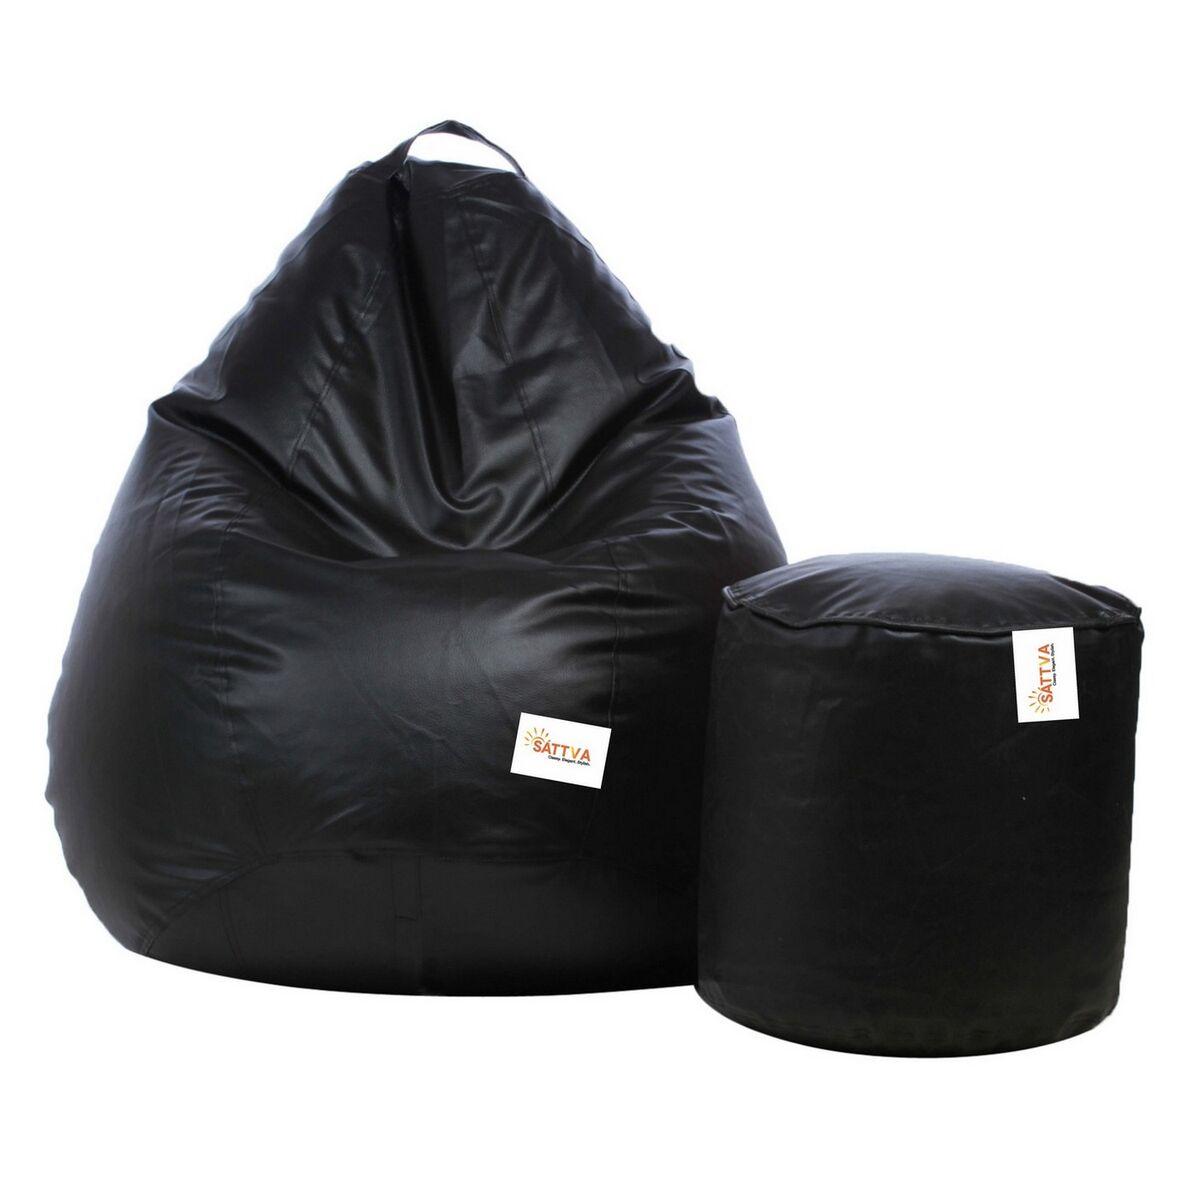 Sattva Combo Classic Bean Bag And Footstool (Filled ) XL - Black (XL, Black)